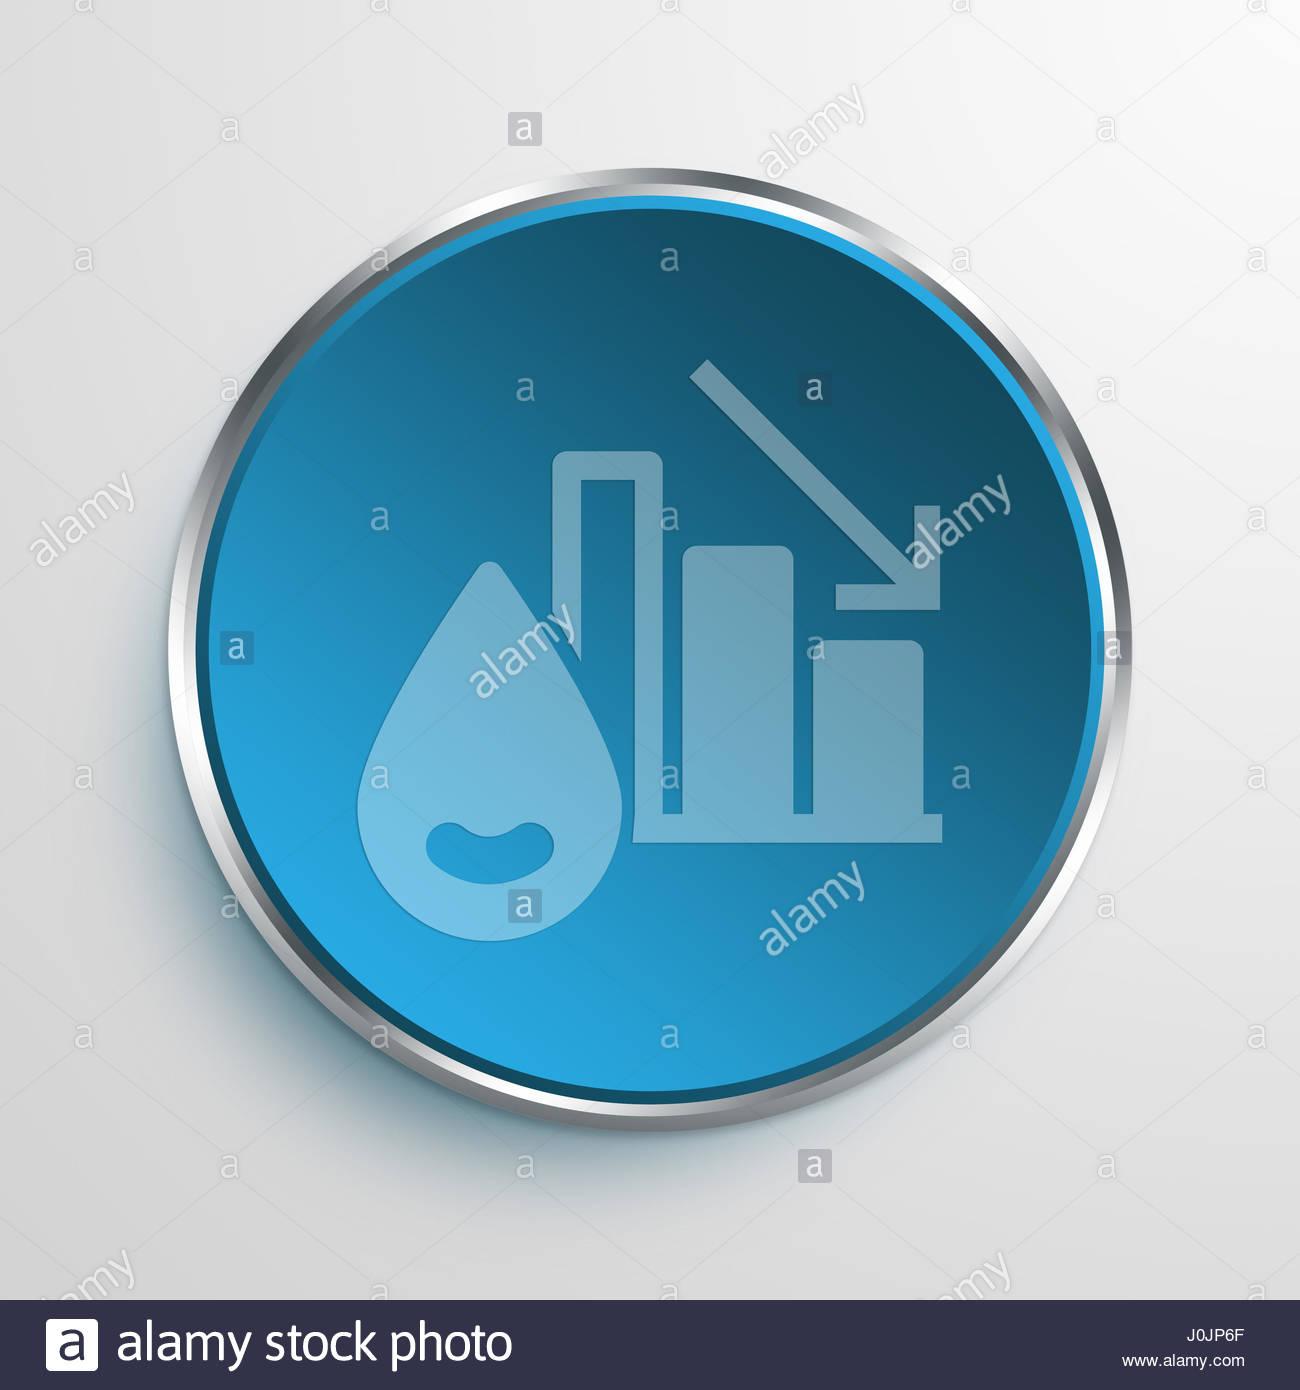 Blue Sign Oil Price Symbol Icon Business Concept No2140 Stock Photo